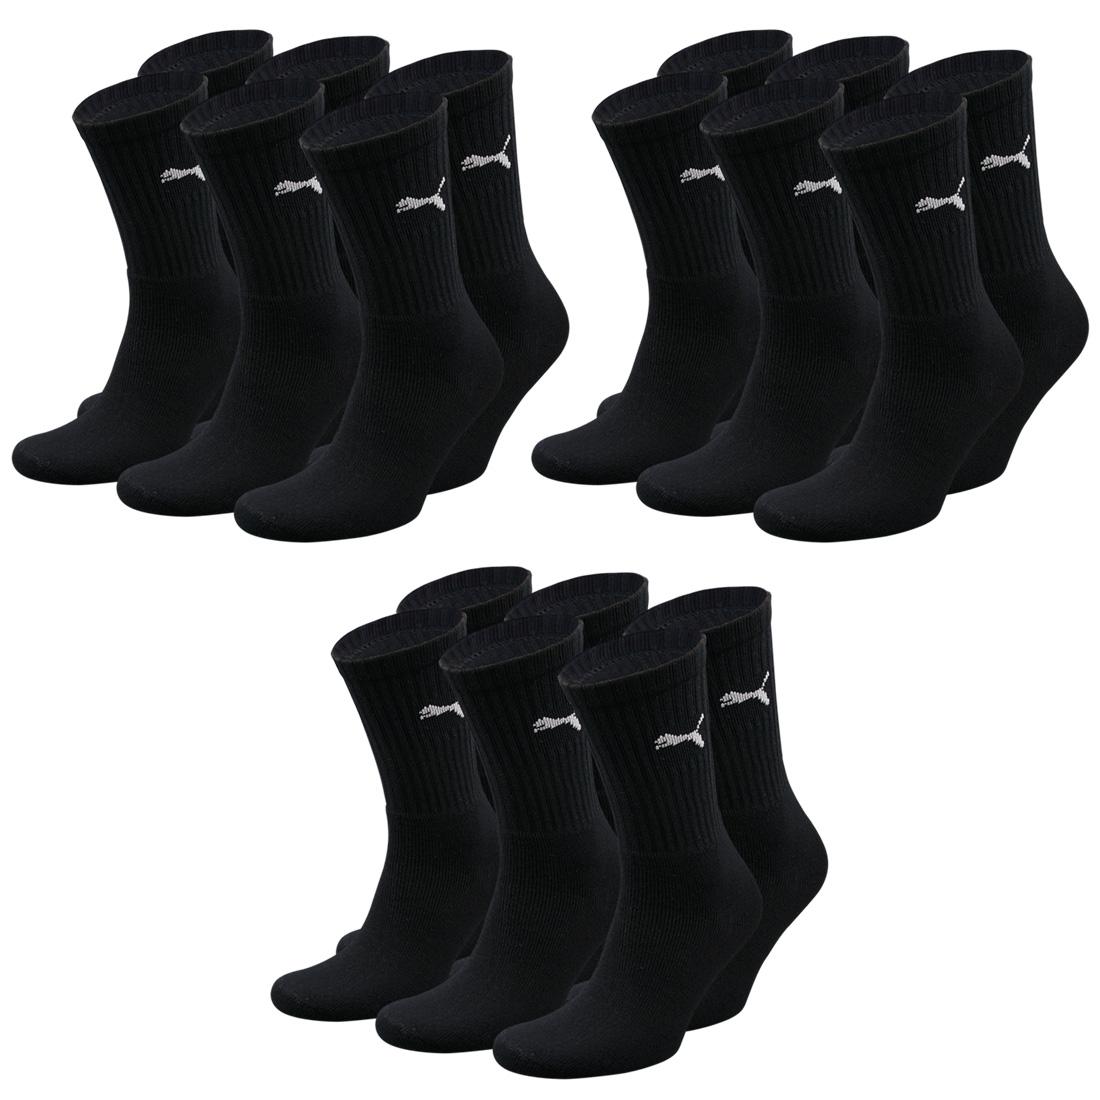 9 Paar Puma Socken, schwarz